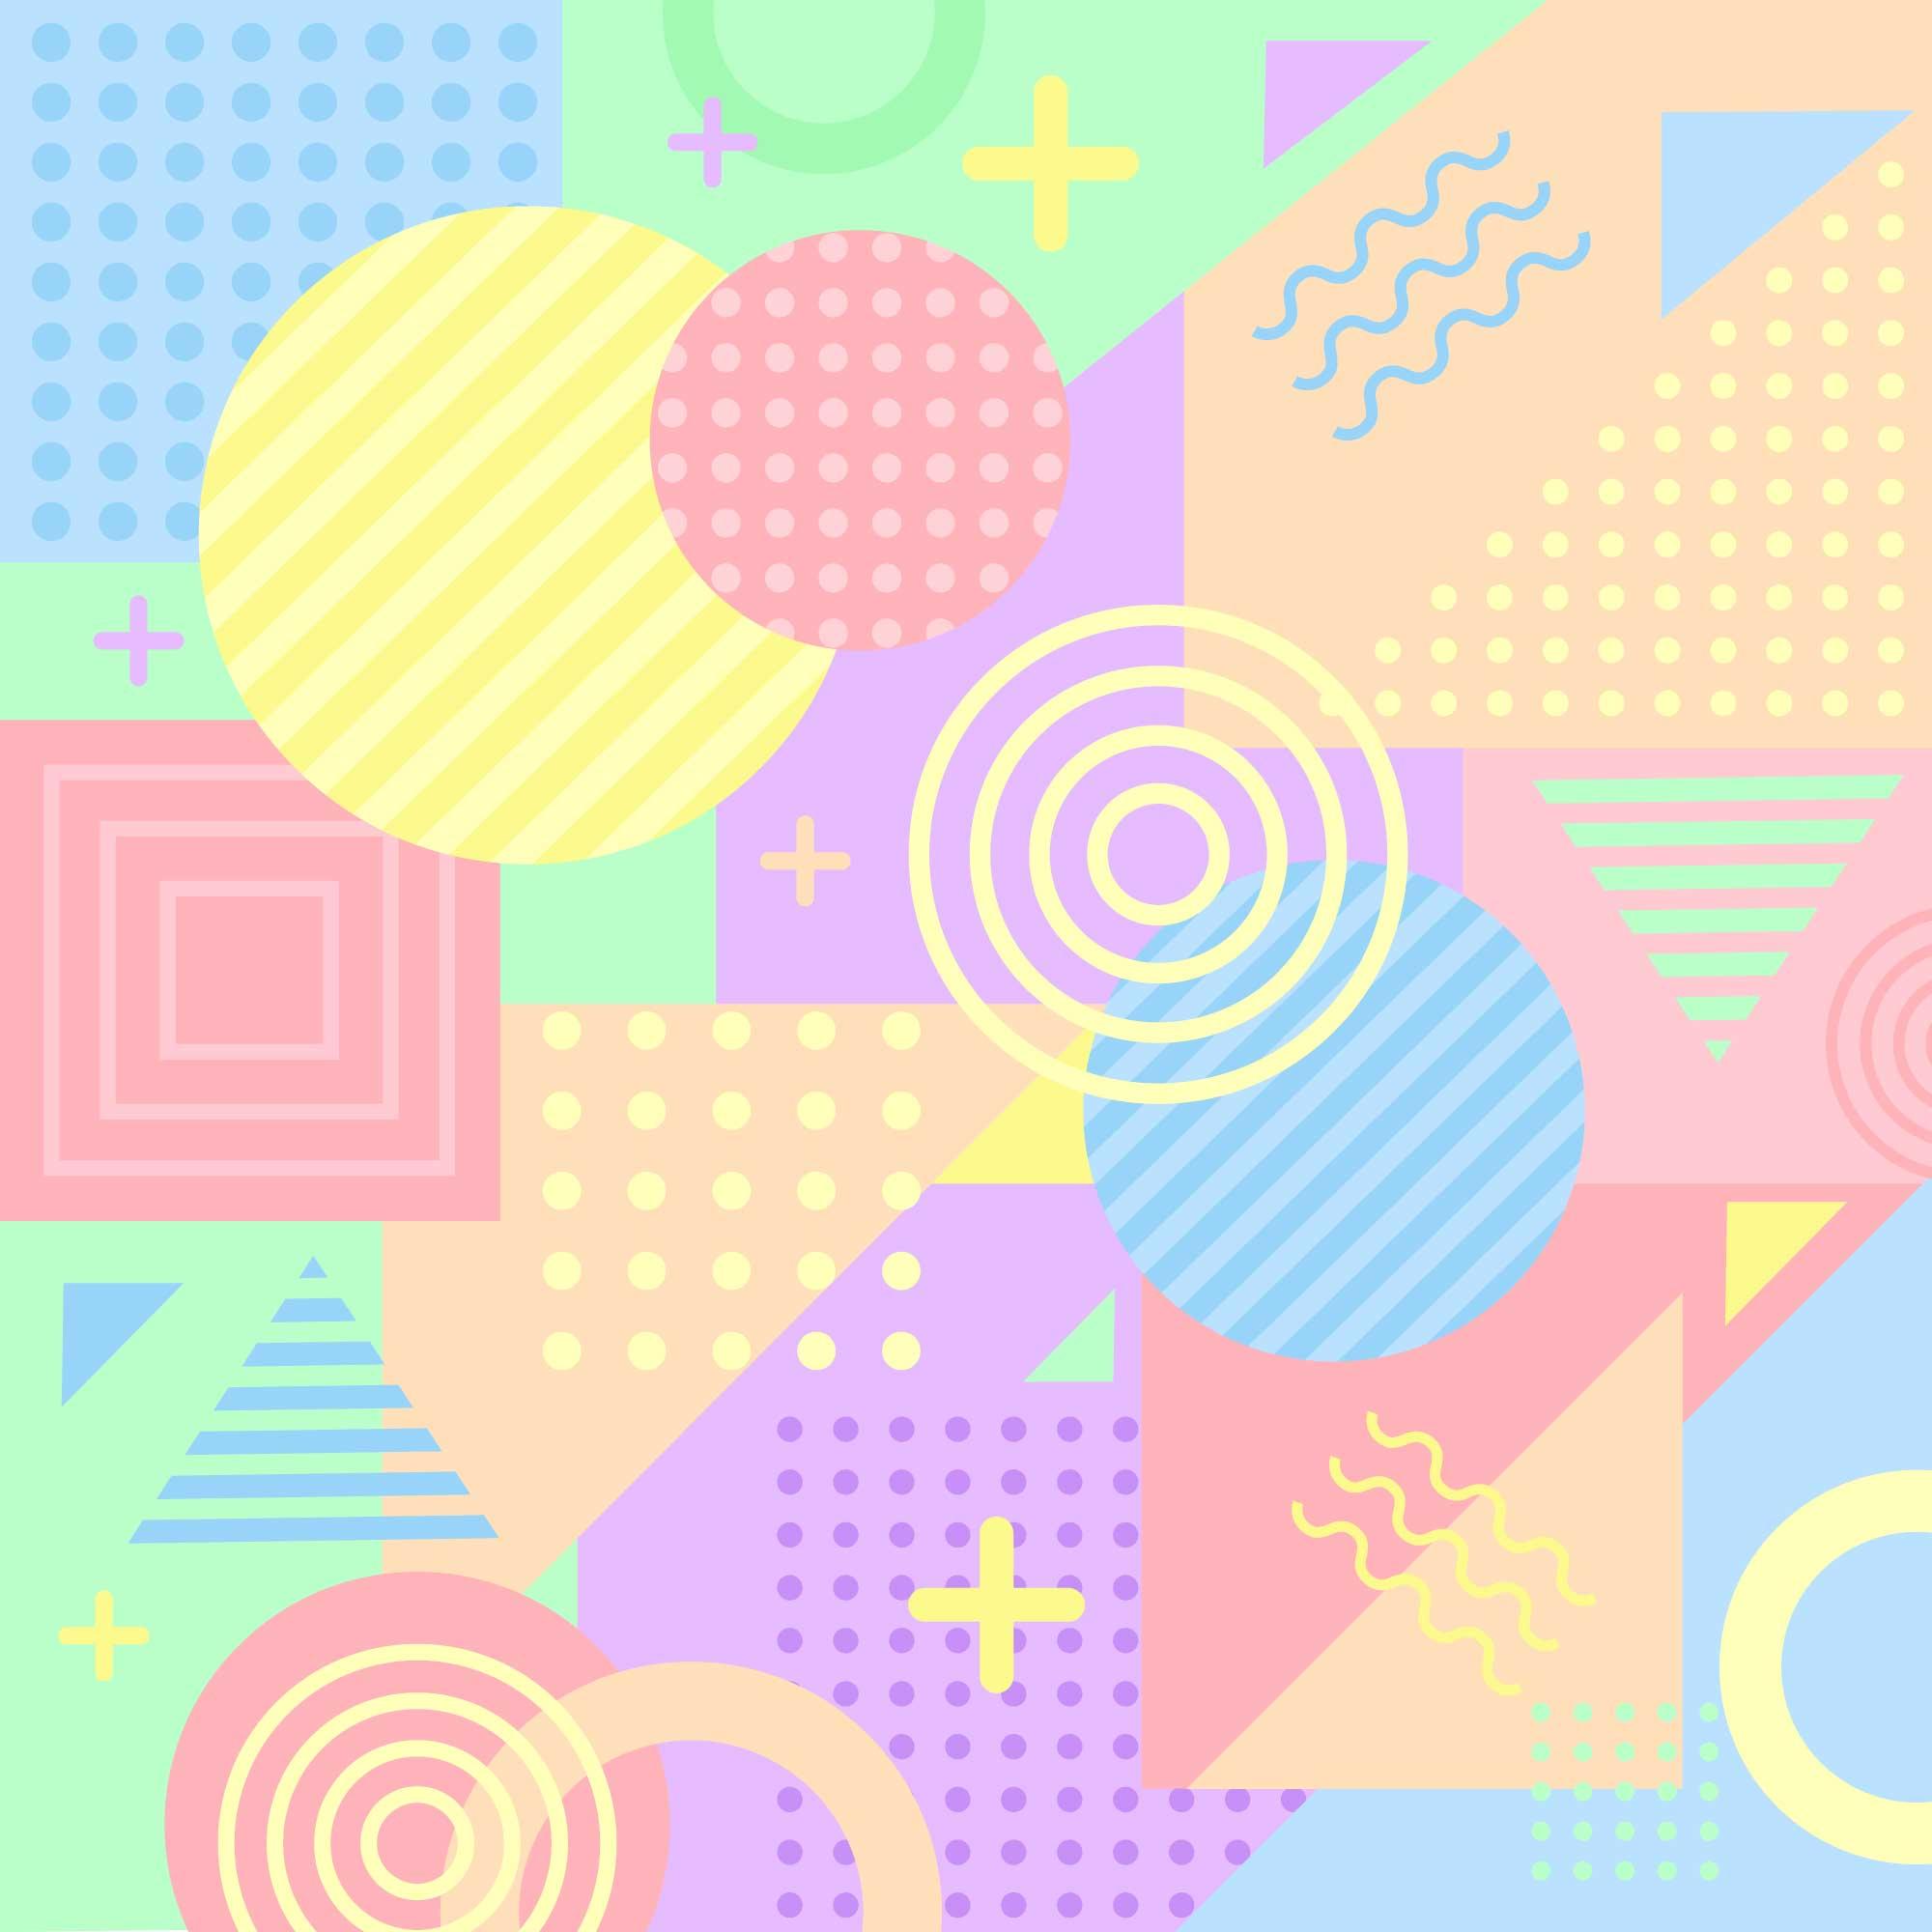 2000x2000 Pastel Colors Free Vector Art